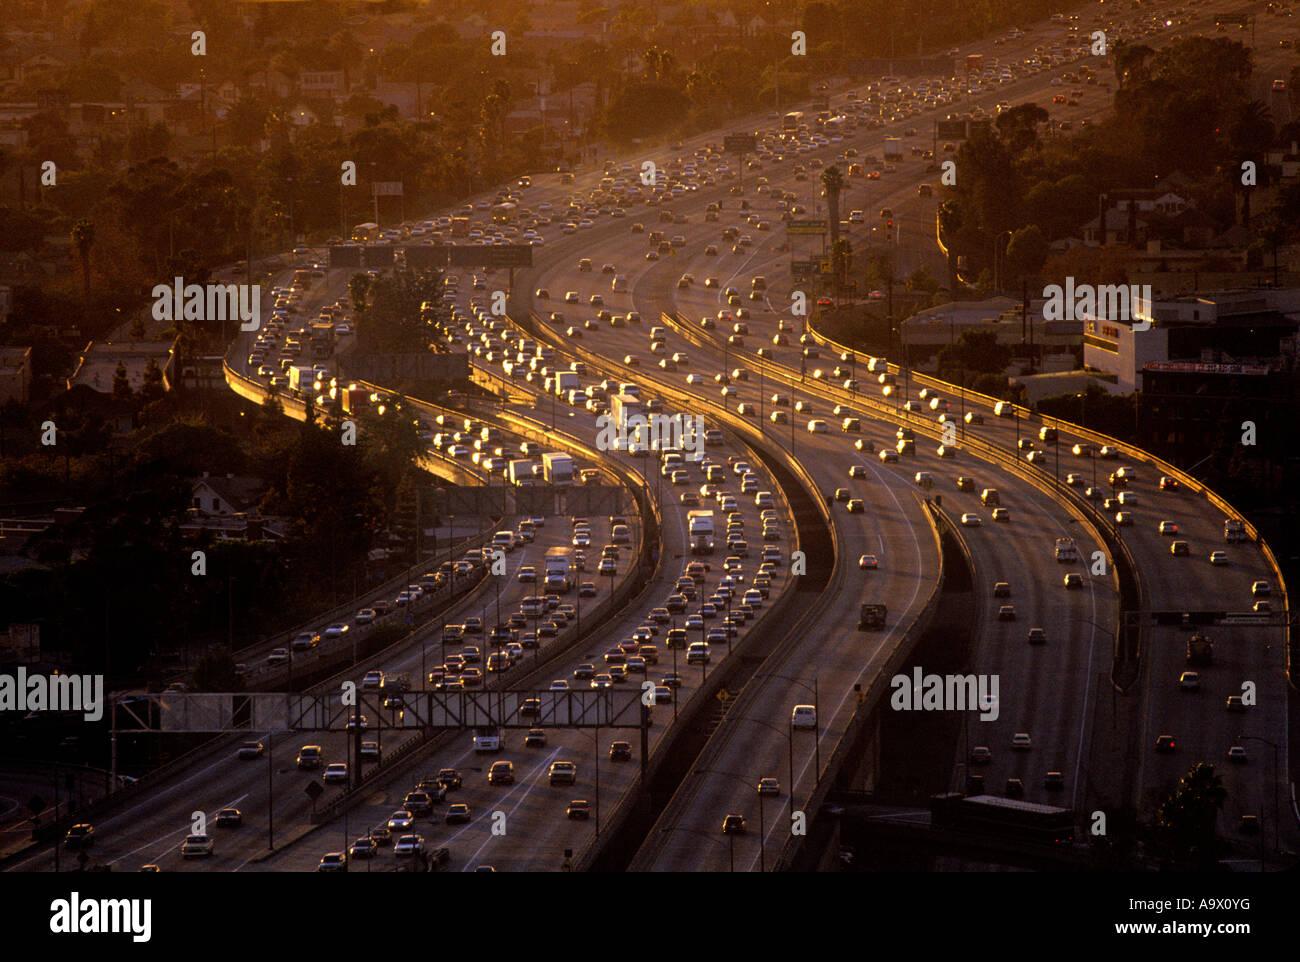 AERIAL ROAD TRAFFIC CONGESTION SANTA MONICA FREEWAY LOS ANGELES CALIFORNIA USA - Stock Image